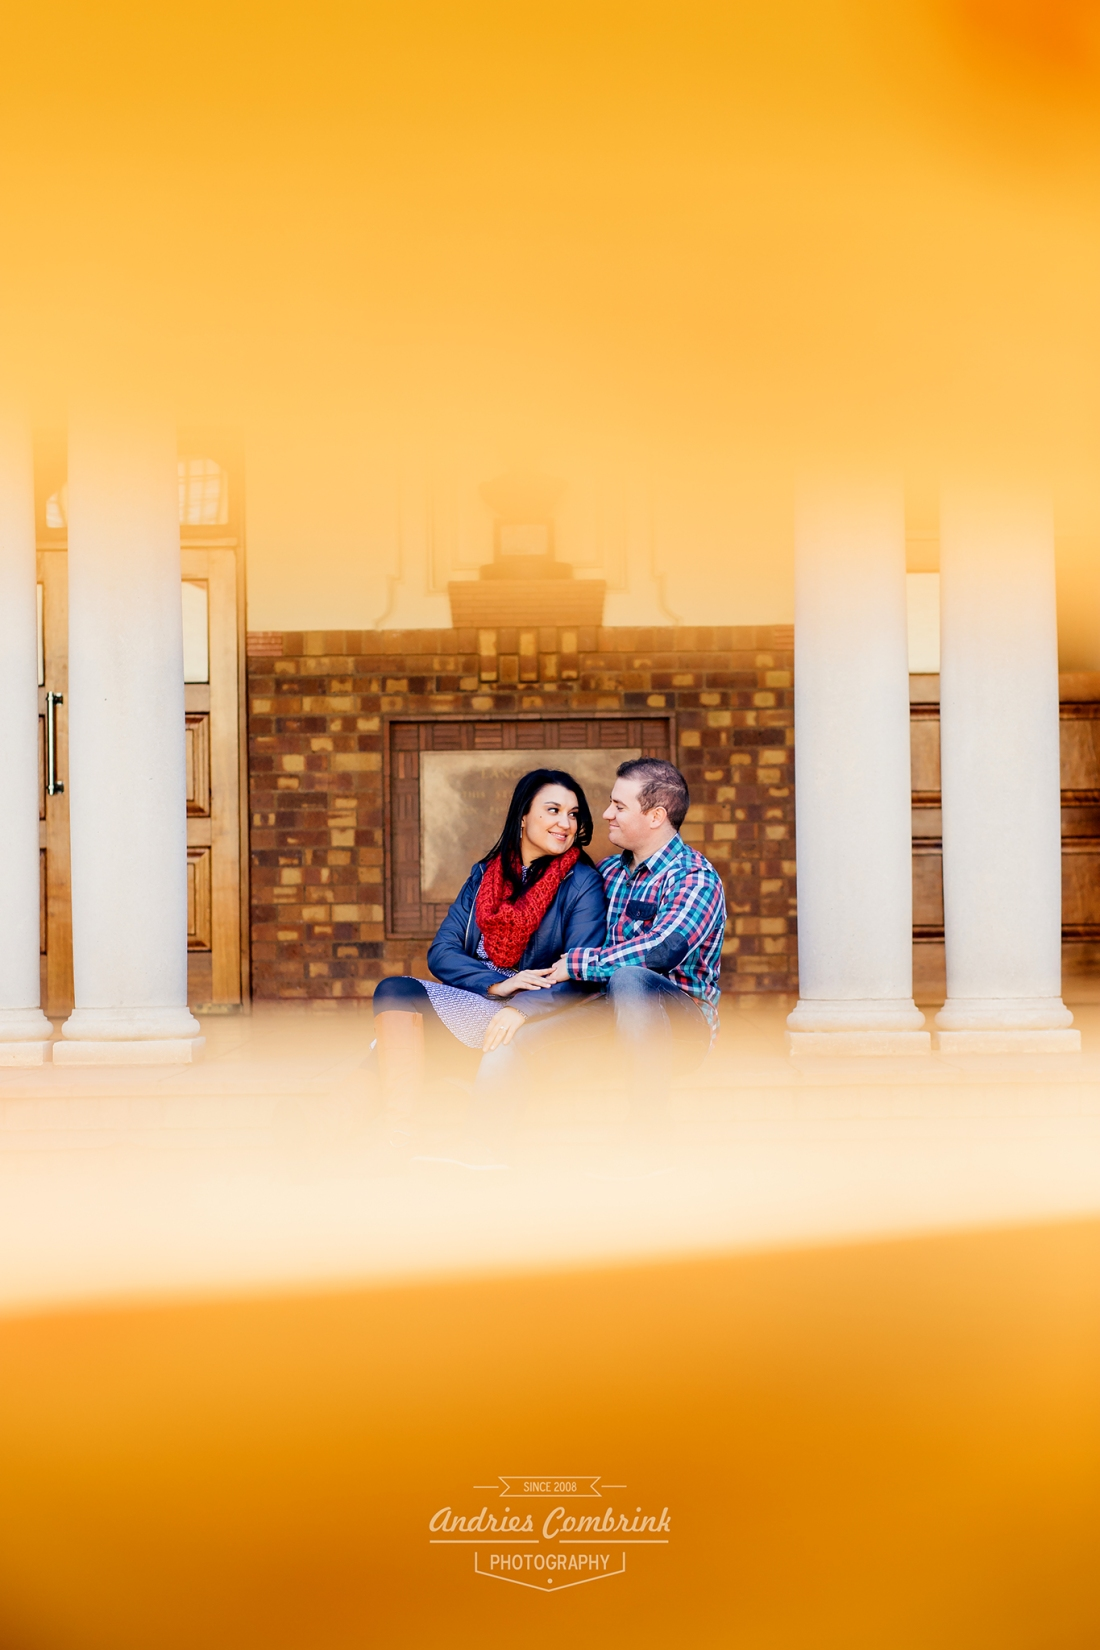 kingmead college creative couple